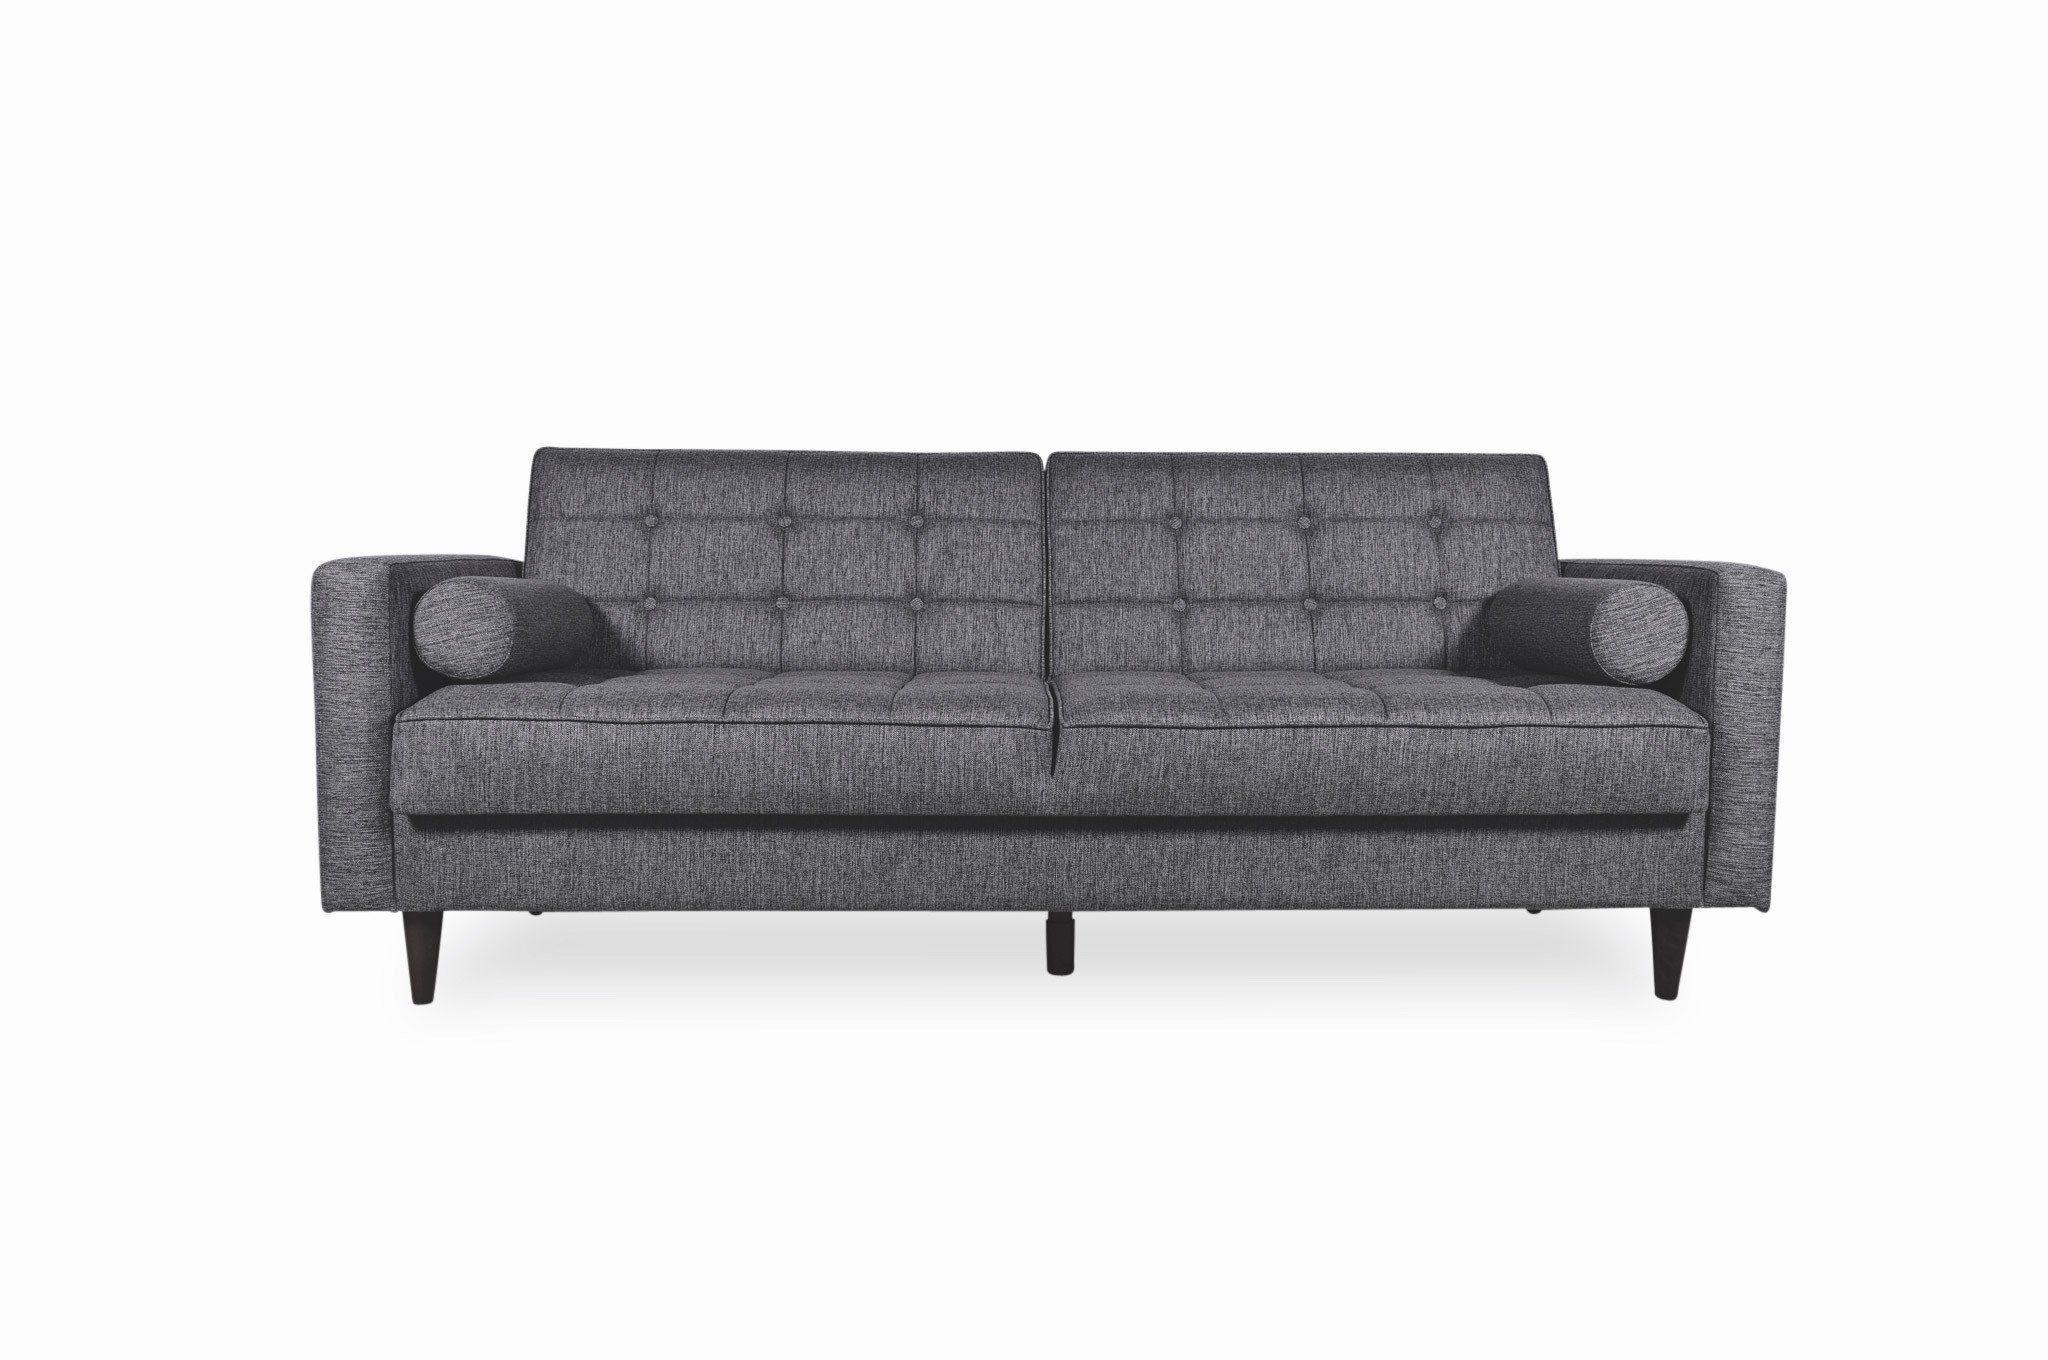 Bennet Sleeper Sofa Seaside Grey Modern Sofa Modern Sleeper Sofa Sofa Furniture